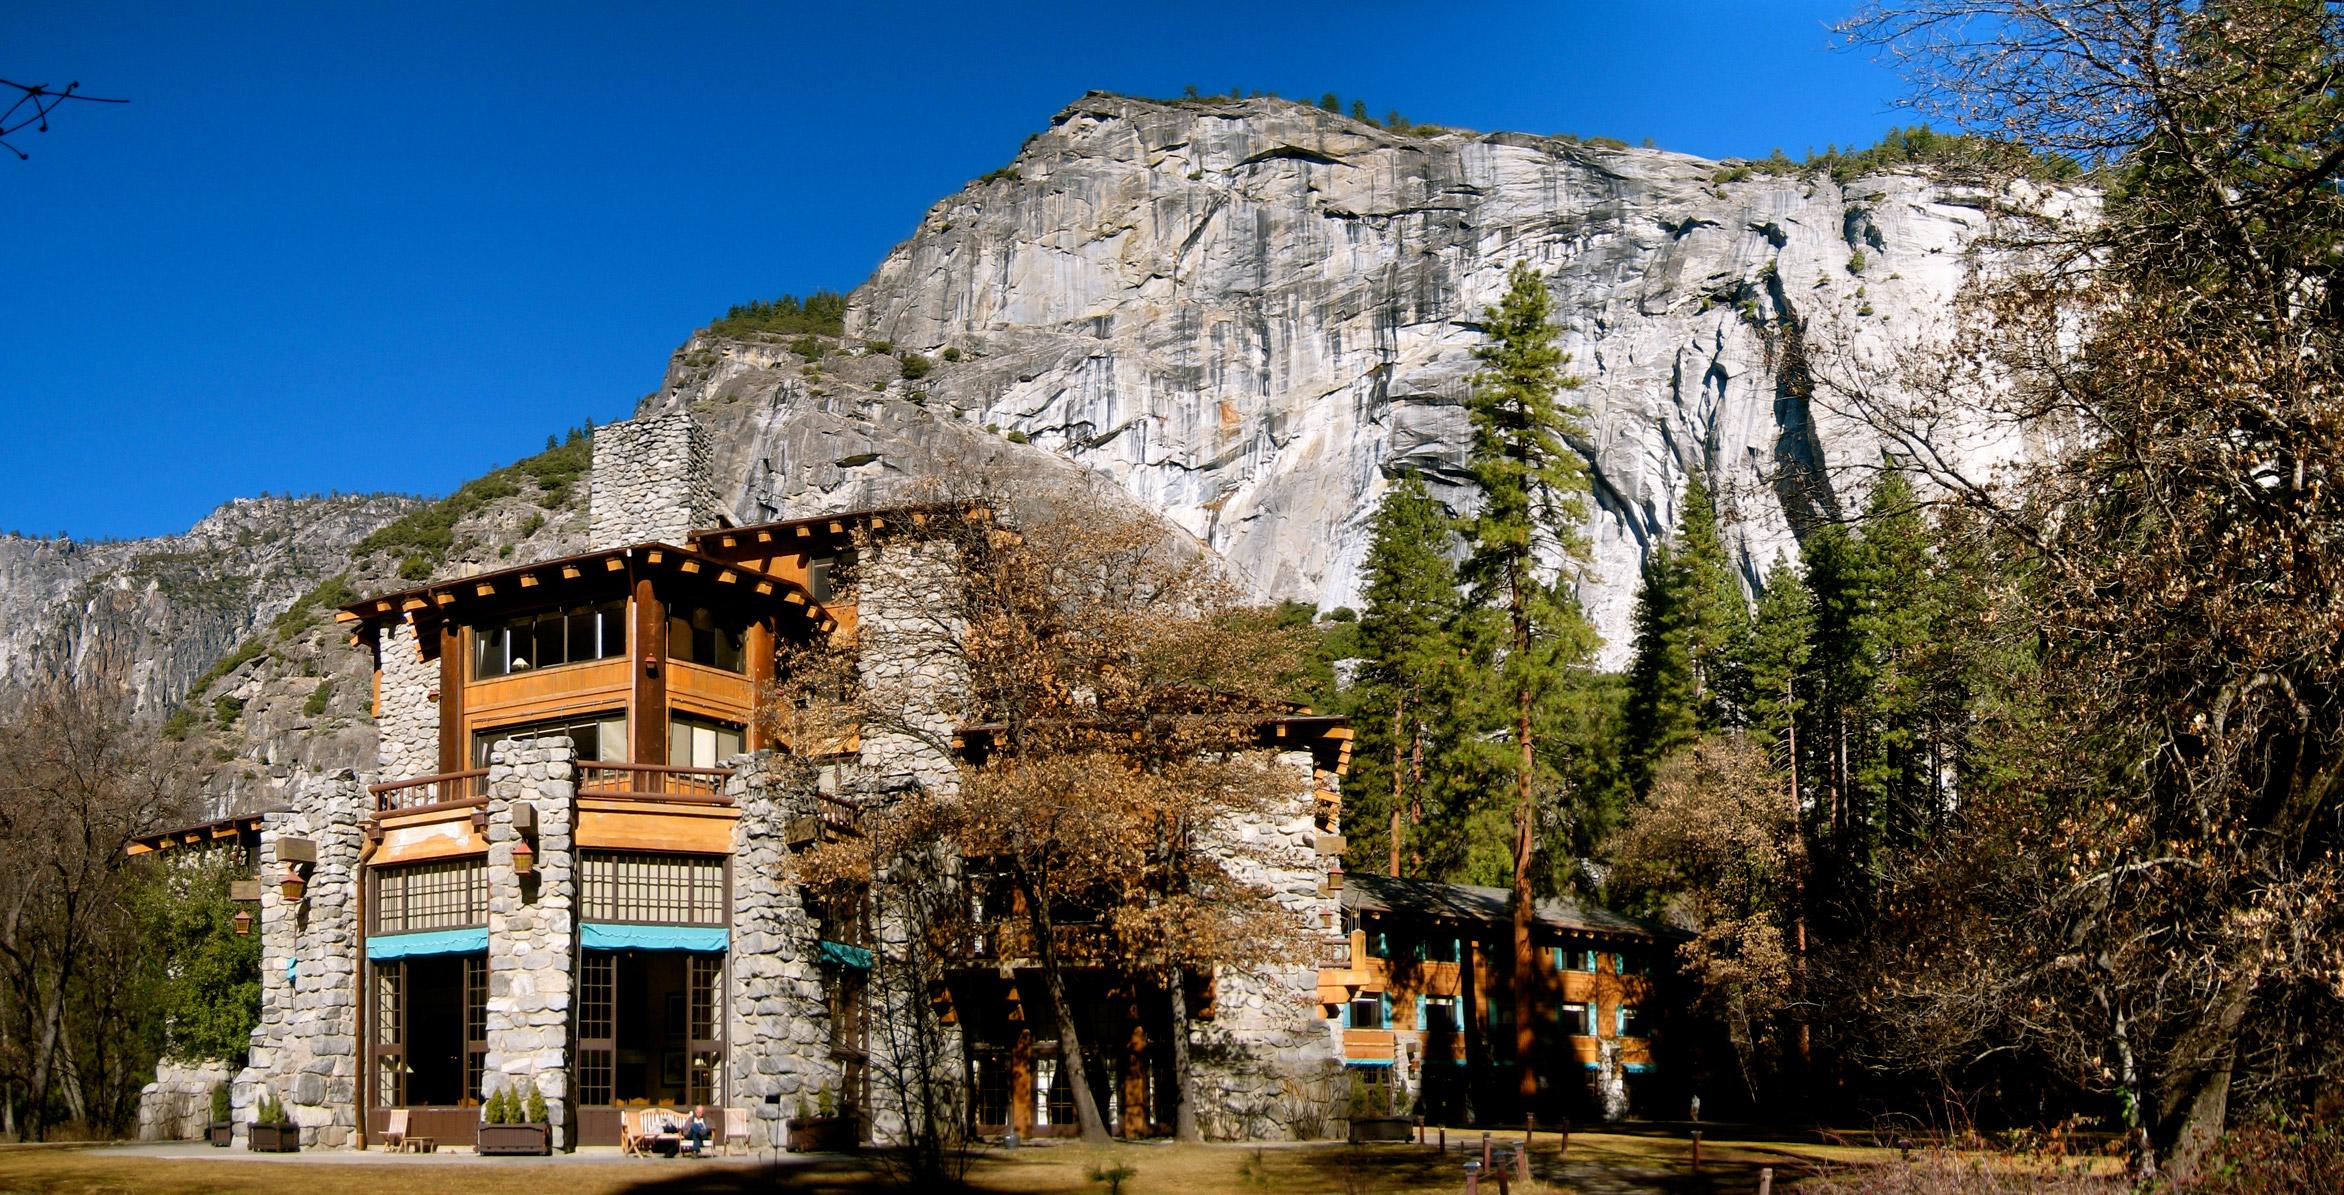 Historic Awanhee Hotel in Yosemite Valley